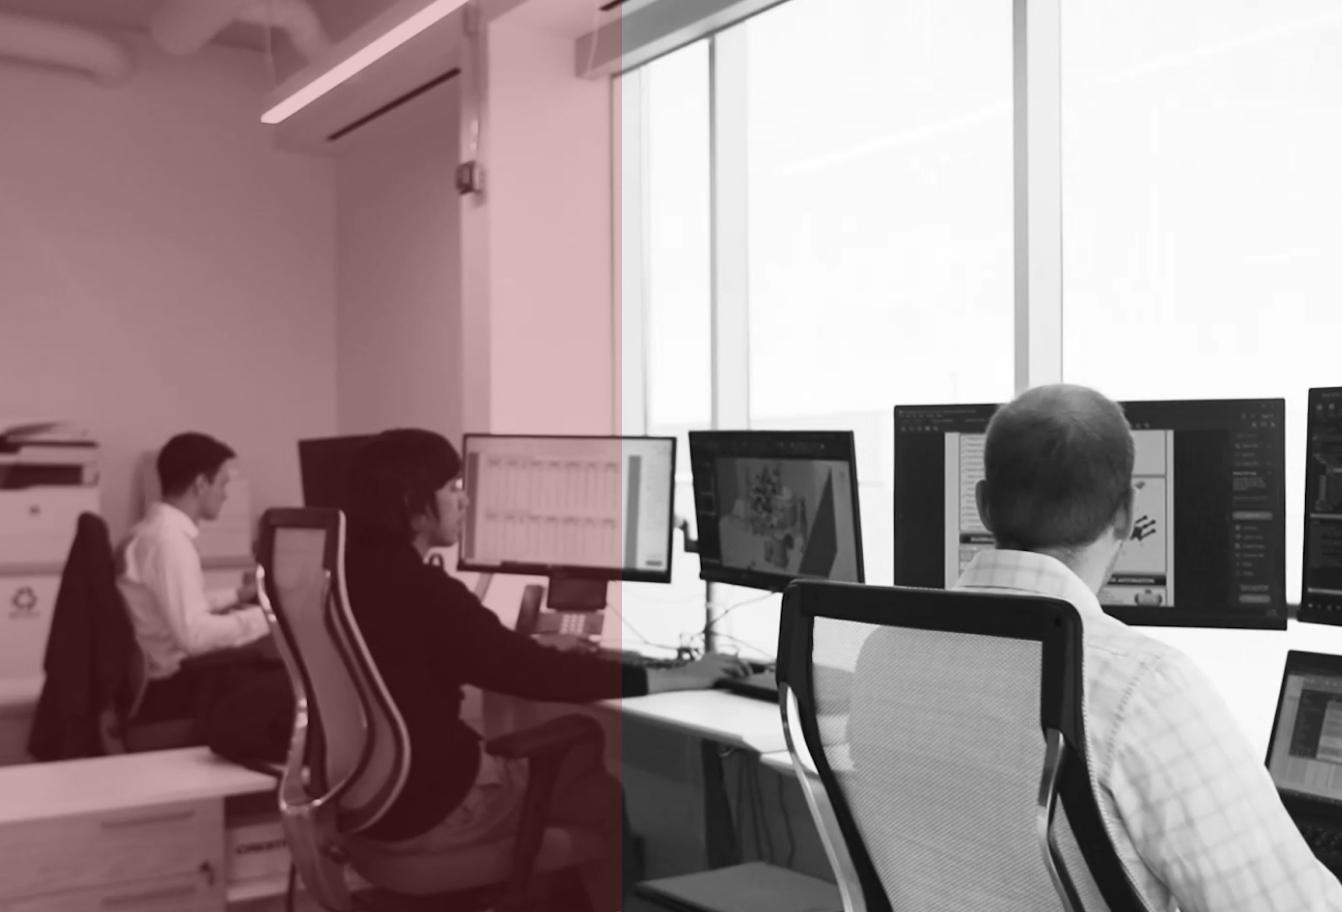 Team Working Image